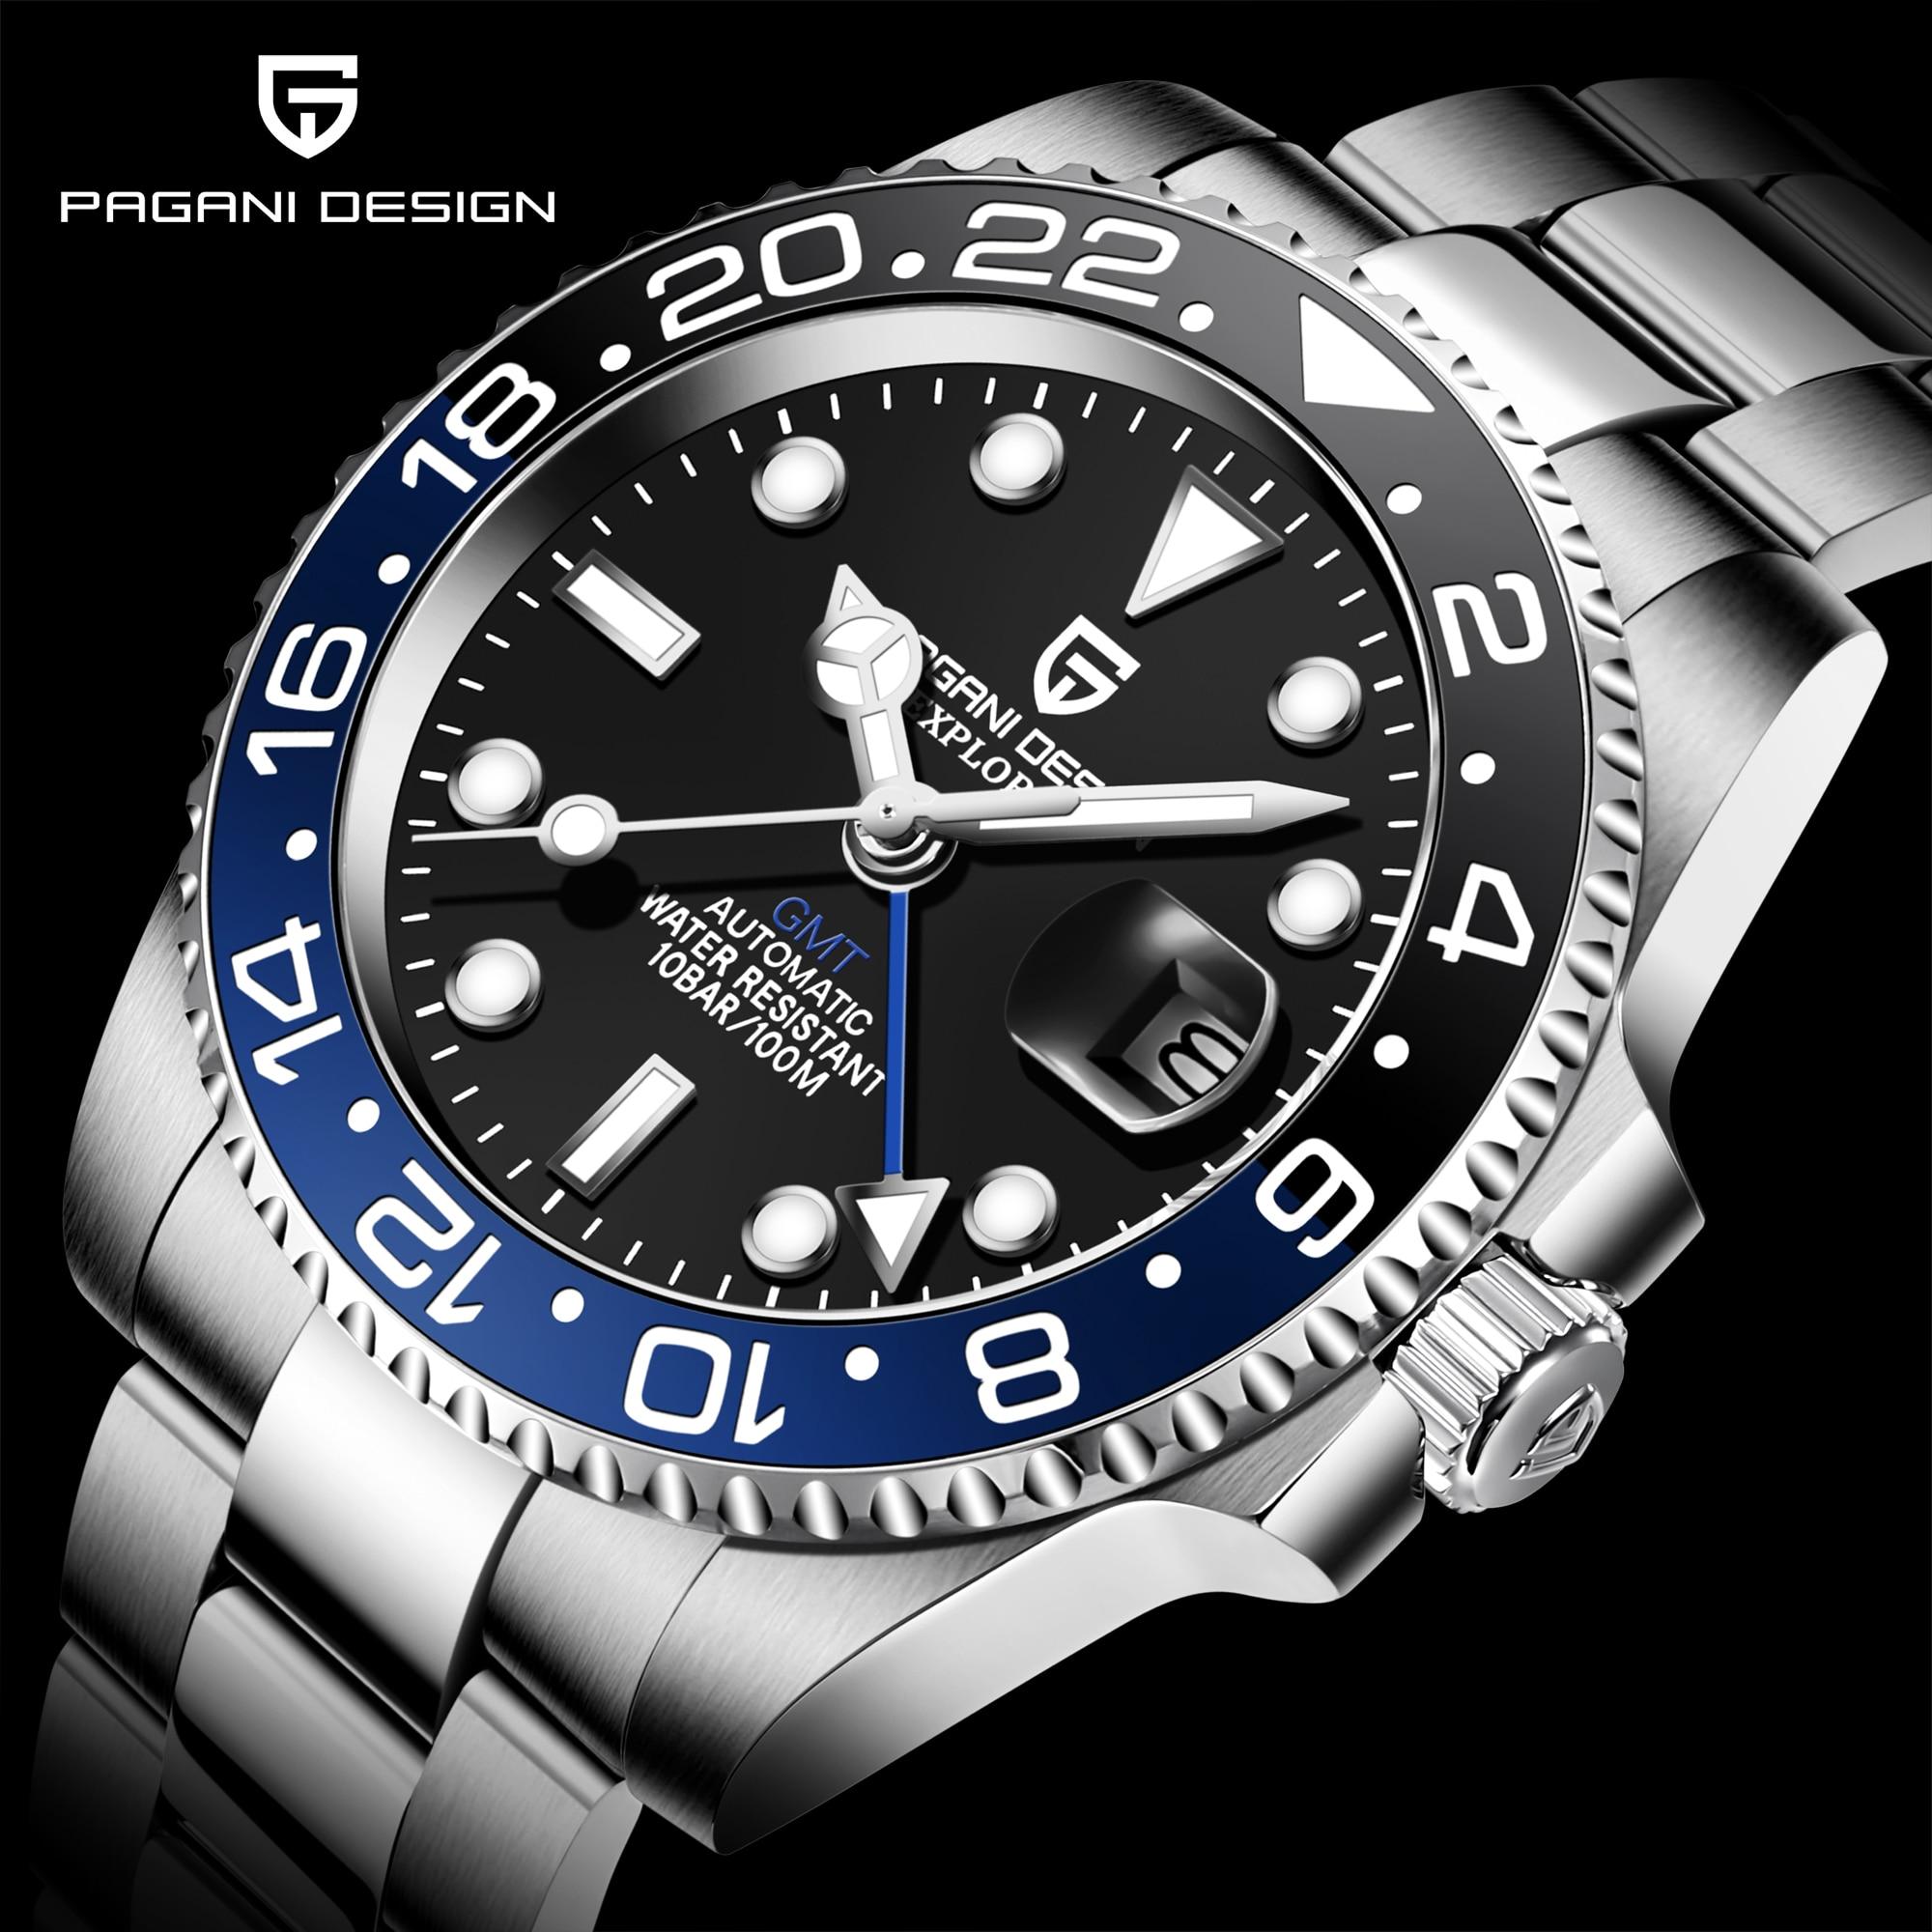 PAGANI DESIGN 2020 Luxury Men Mechanical Wristwatch Stainless Steel GMT Watch Top Brand Sapphire Glass Men Watches reloj hombre(China)